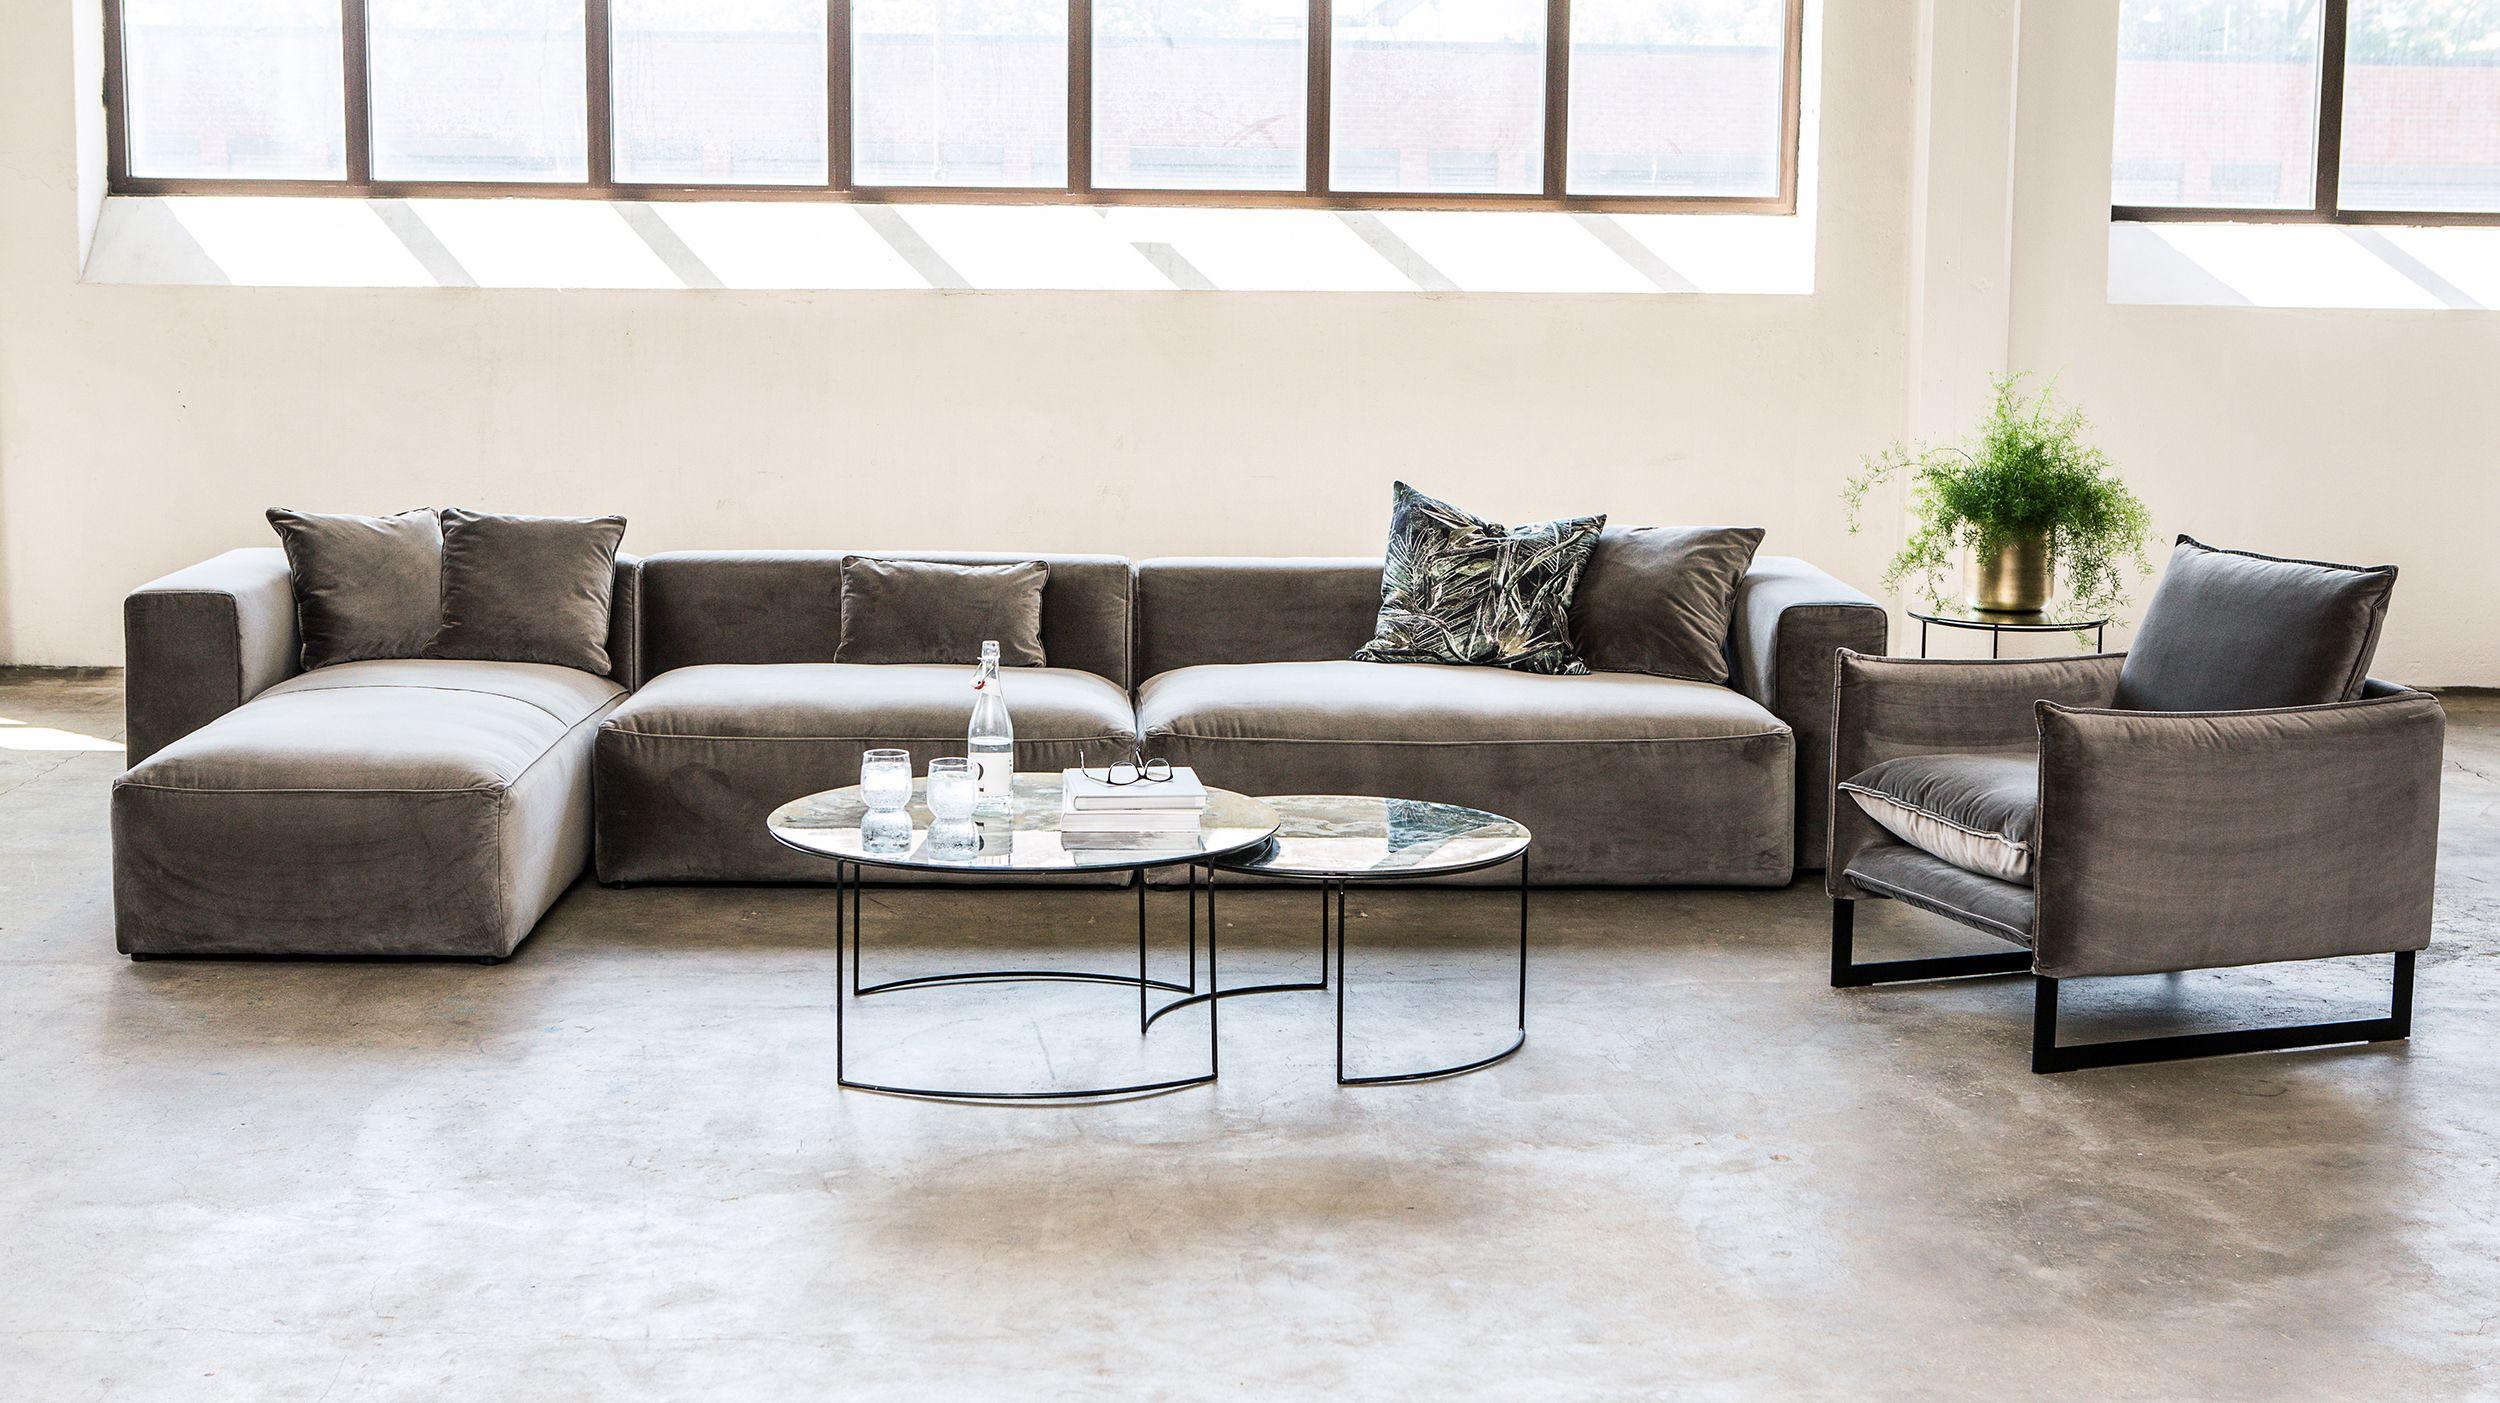 Luna lounge sofa - Home&Cottage | Home&Cottage | Pinterest | Lounge sofa